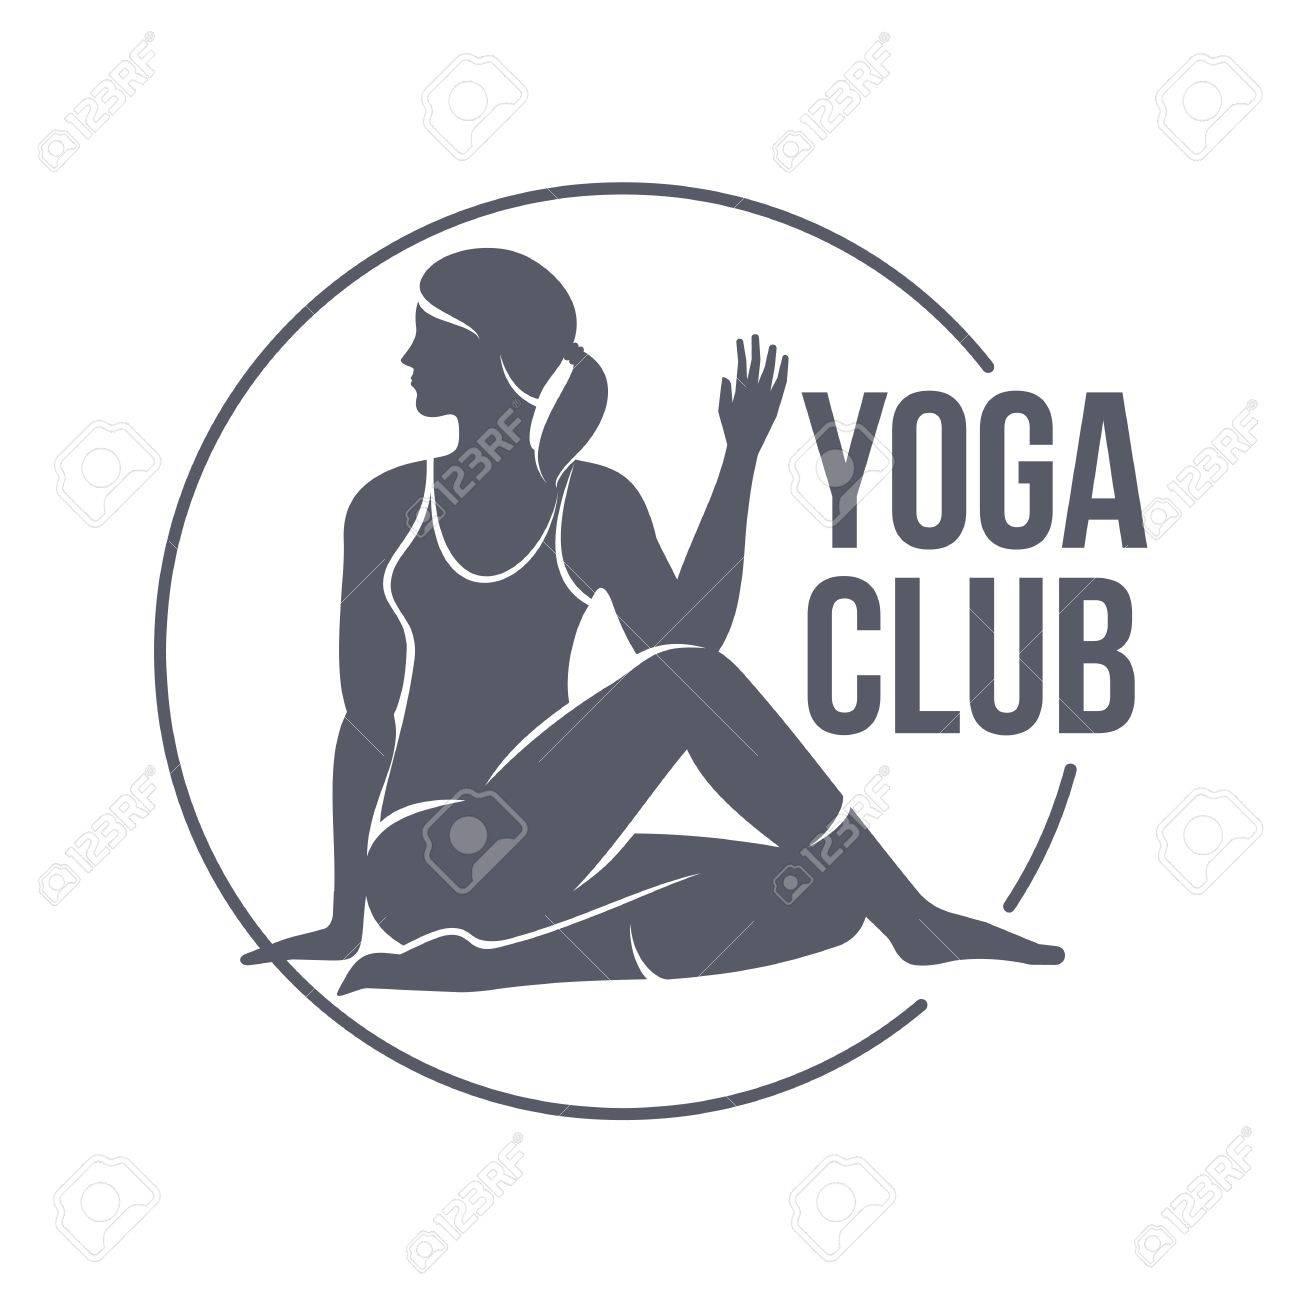 Yoga Club Logo Vorlagen. Fitness, Aerobic, Trainingsübungen Im ...